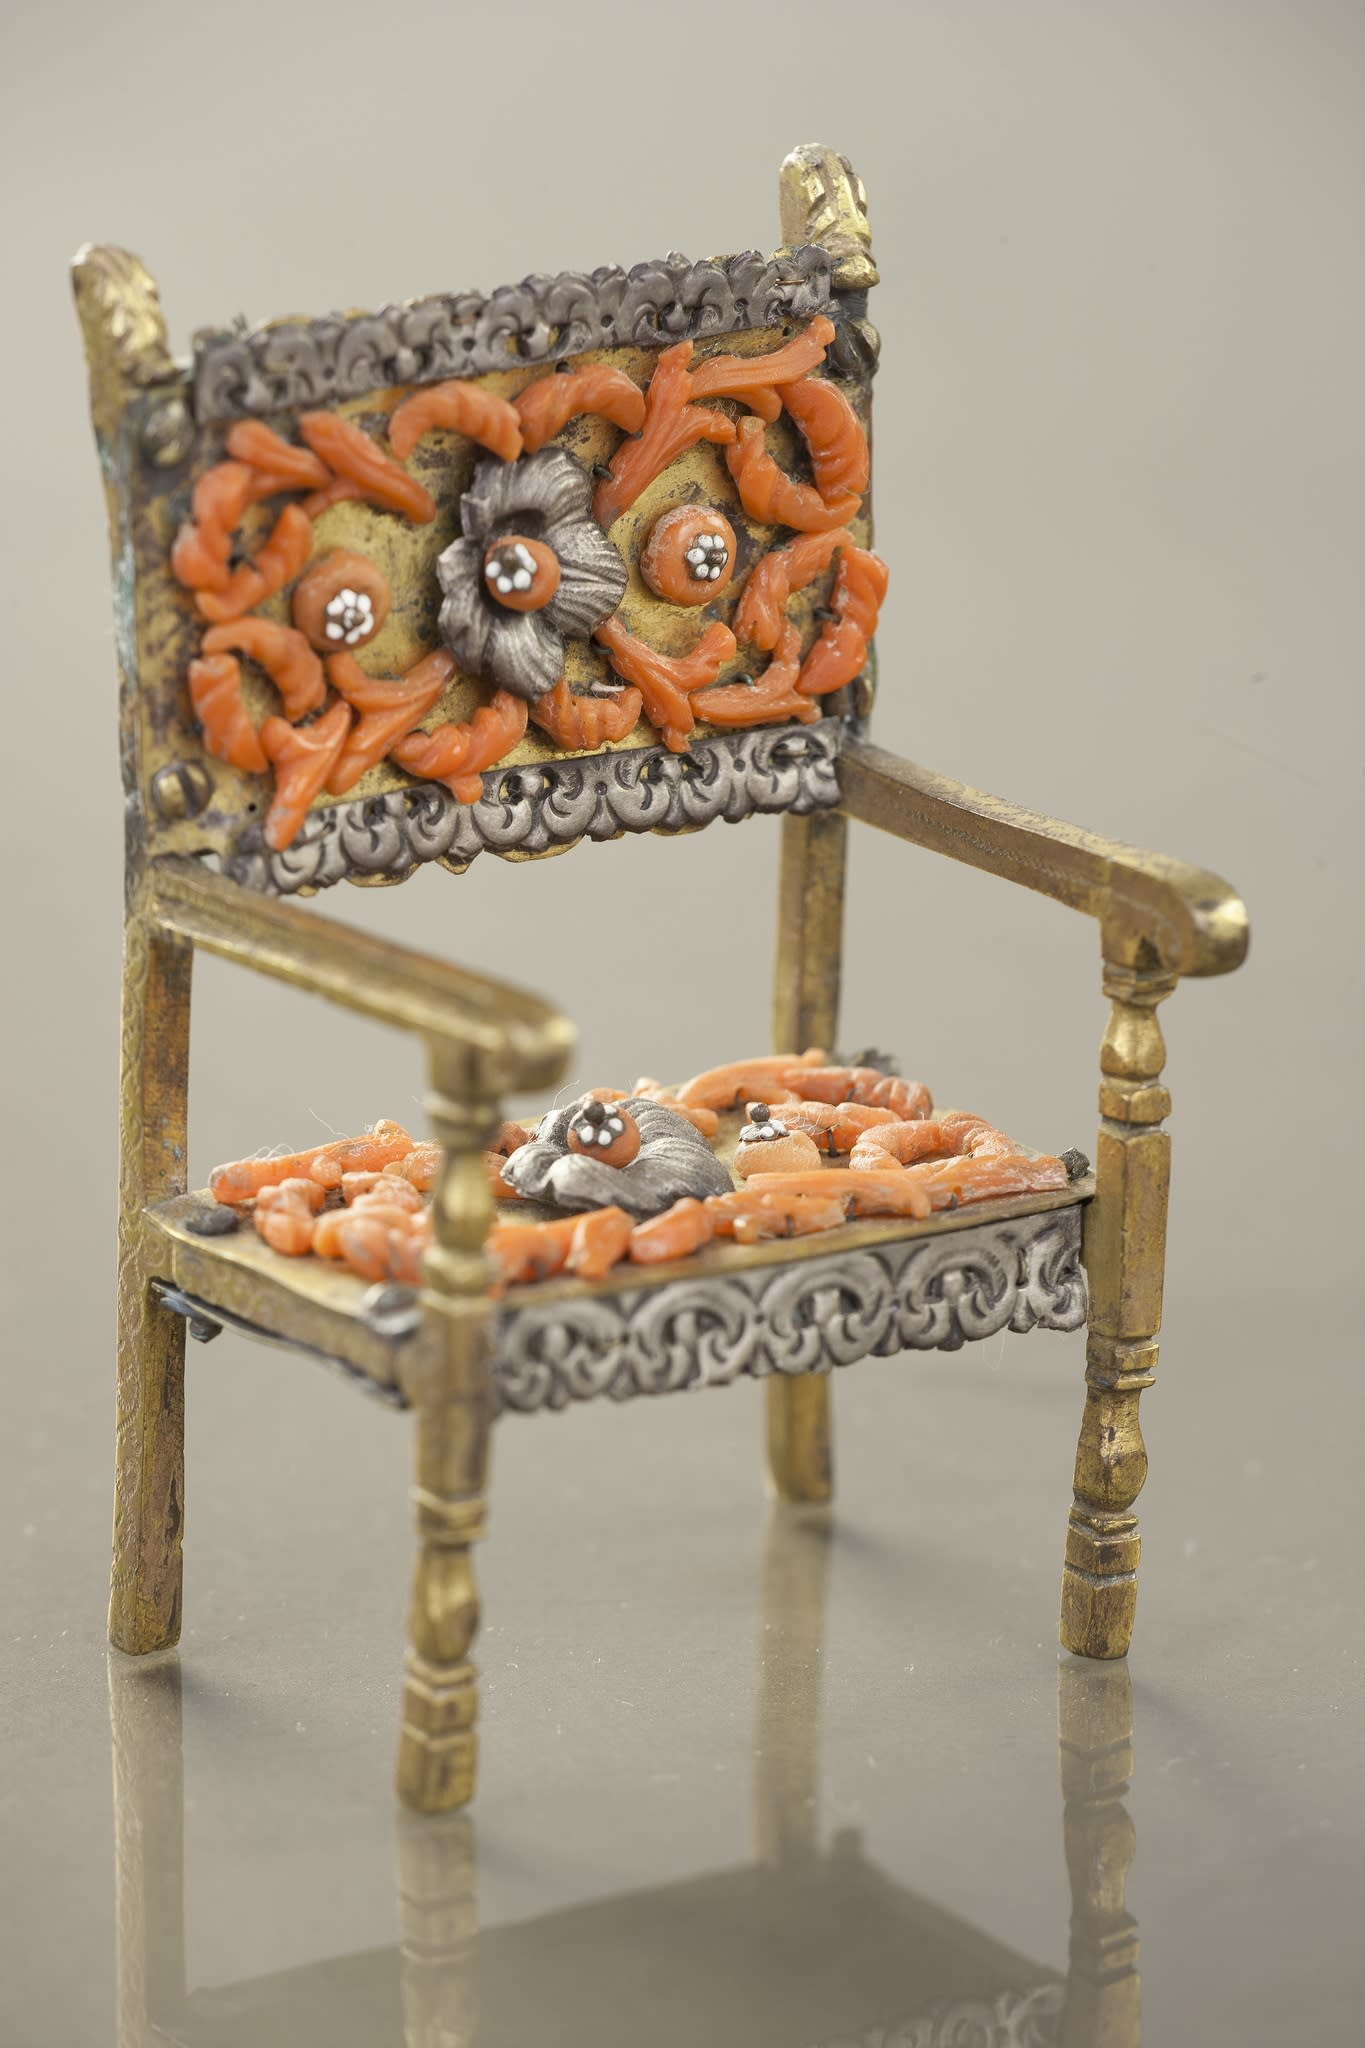 https://artlogic-res.cloudinary.com/w_2400,h_2400,c_limit,f_auto,fl_lossy,q_auto/artlogicstorage/brunfineart/images/view/75ba115c2ead62b0f6c71e9e8e0c2b1799239b55/brunfineart-trapani-miniature-furniture-17th-18th-century.jpg